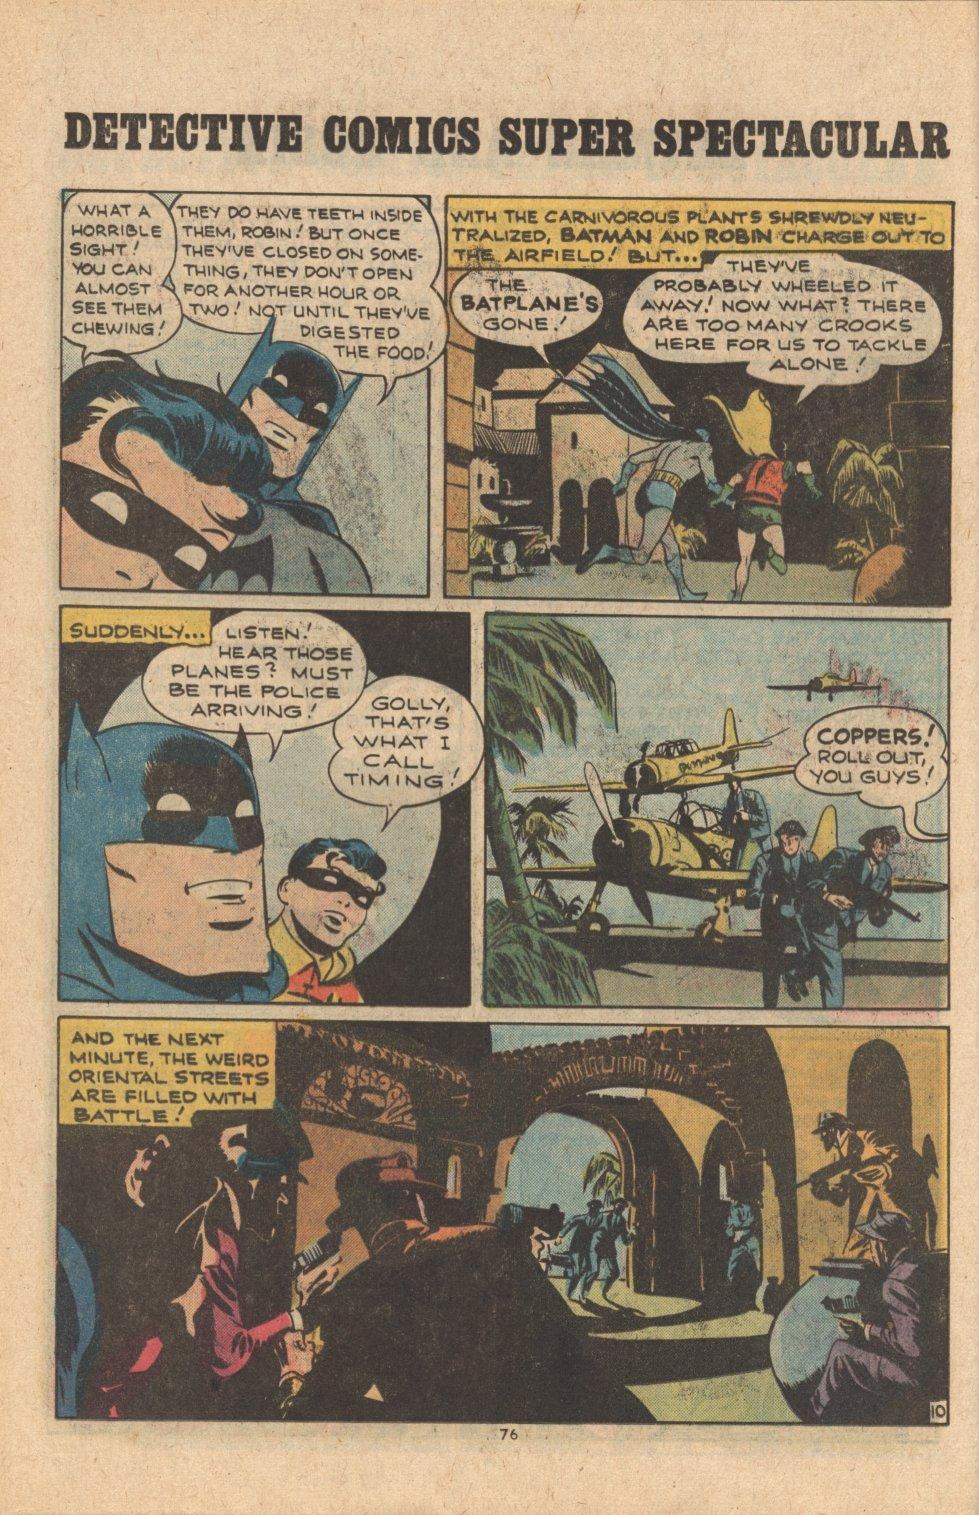 Detective Comics (1937) 442 Page 75